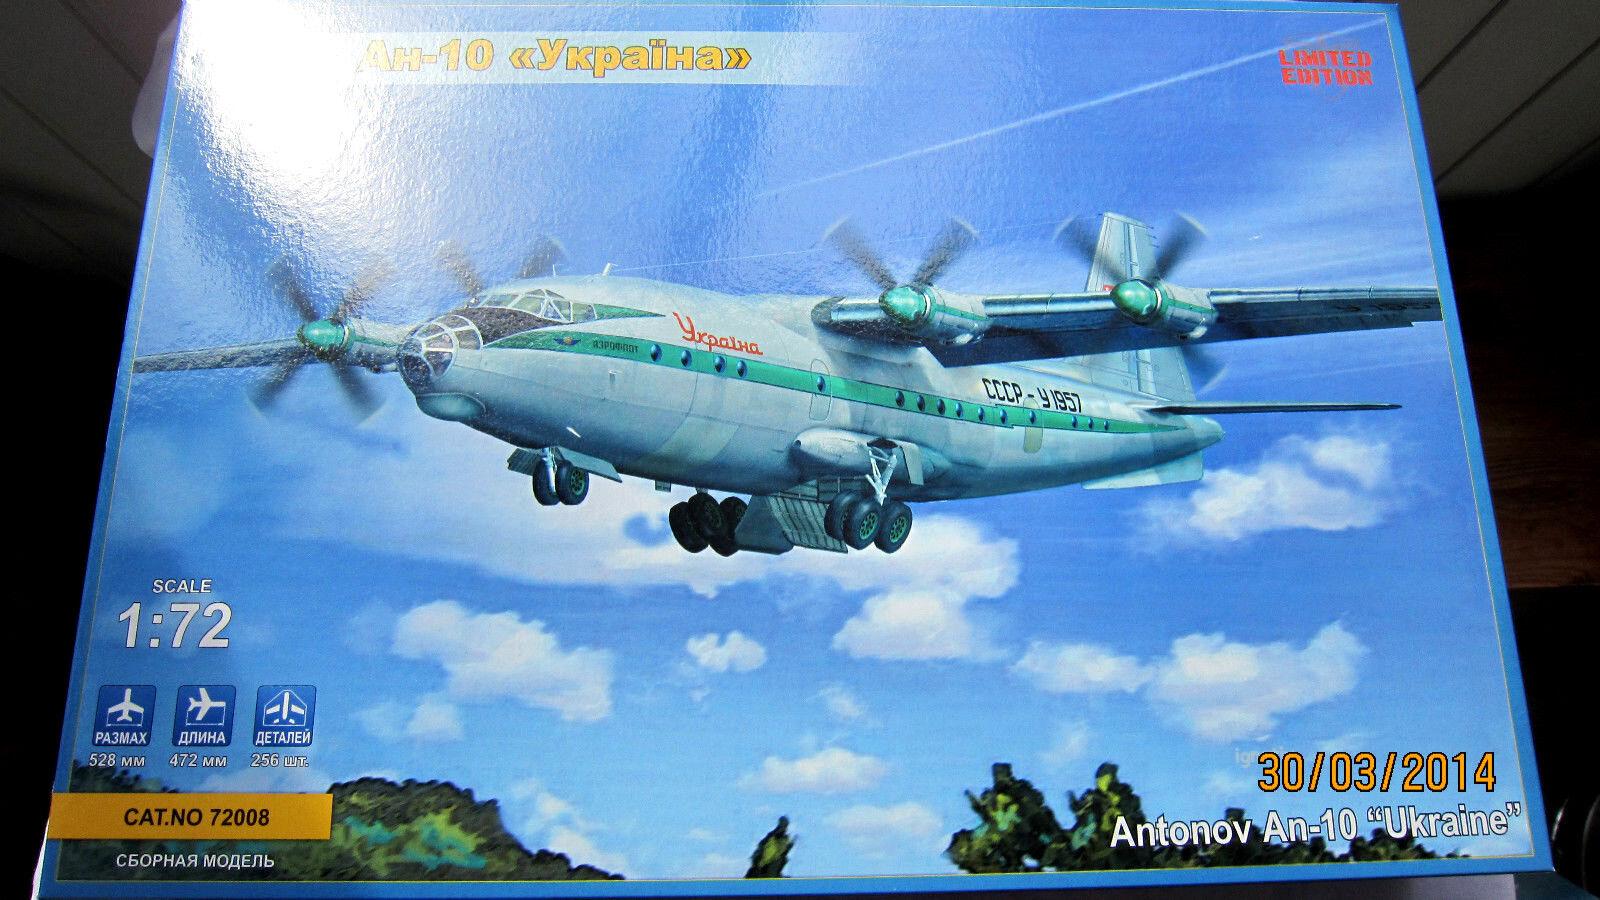 Antonov AN-10  Ukraine  aircraft model kit  1 72 ModelSvit